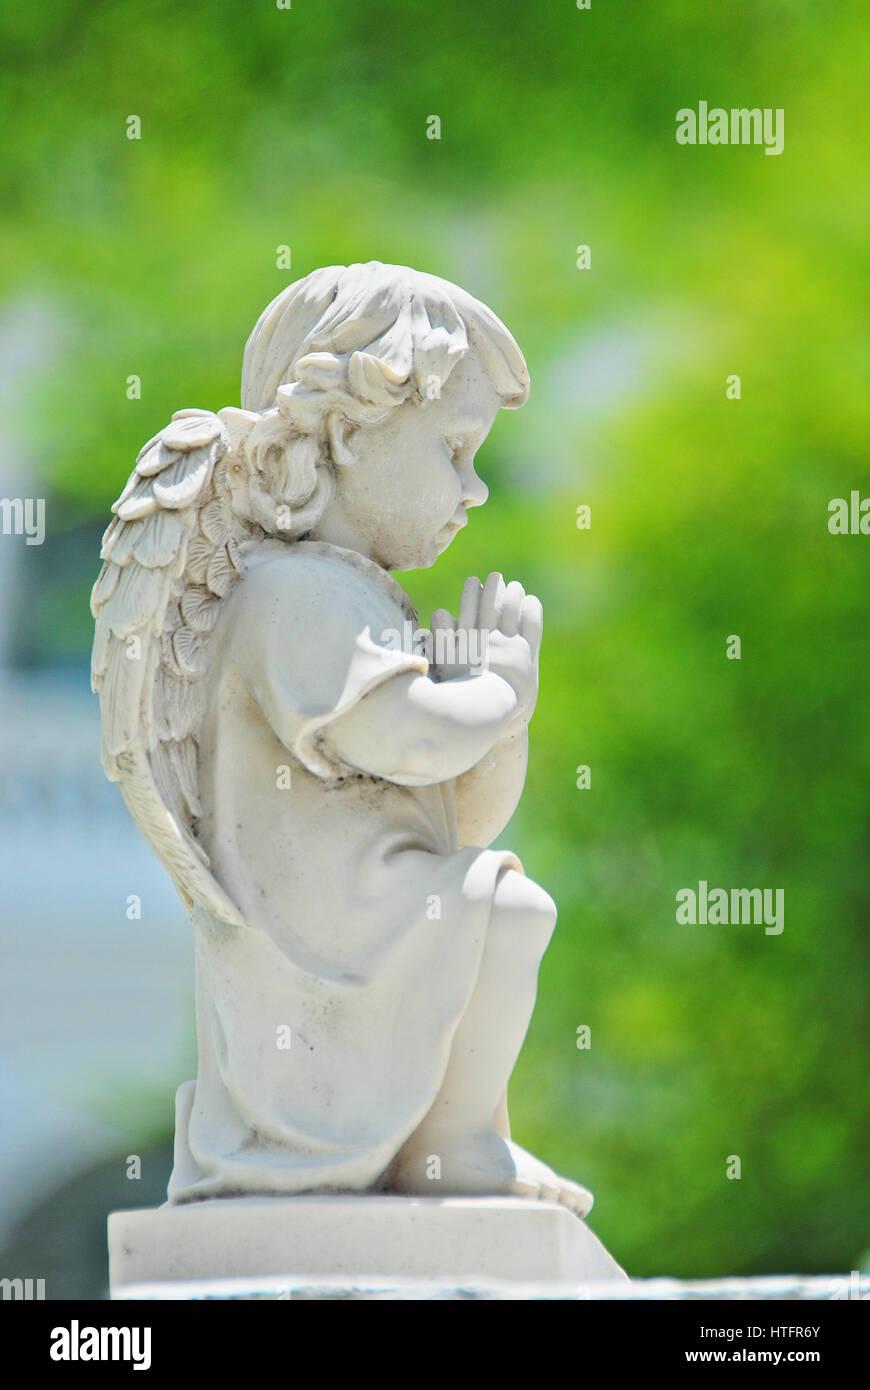 Angel pray pose sculpture - Stock Image